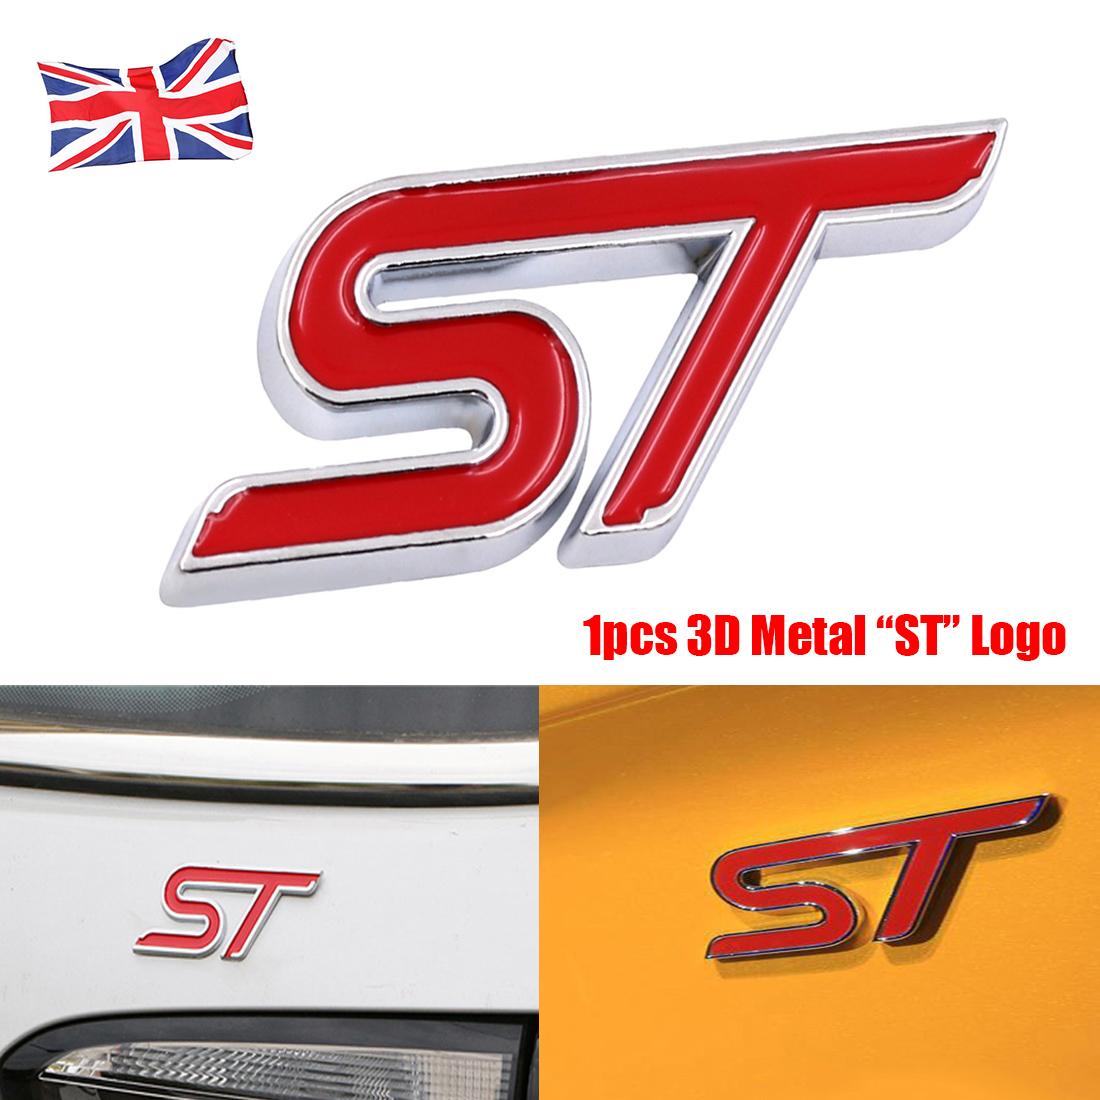 ST Metal Red Boot Wing Tailgate Side Badge Emblem Sticker Focus Fiesta Logo